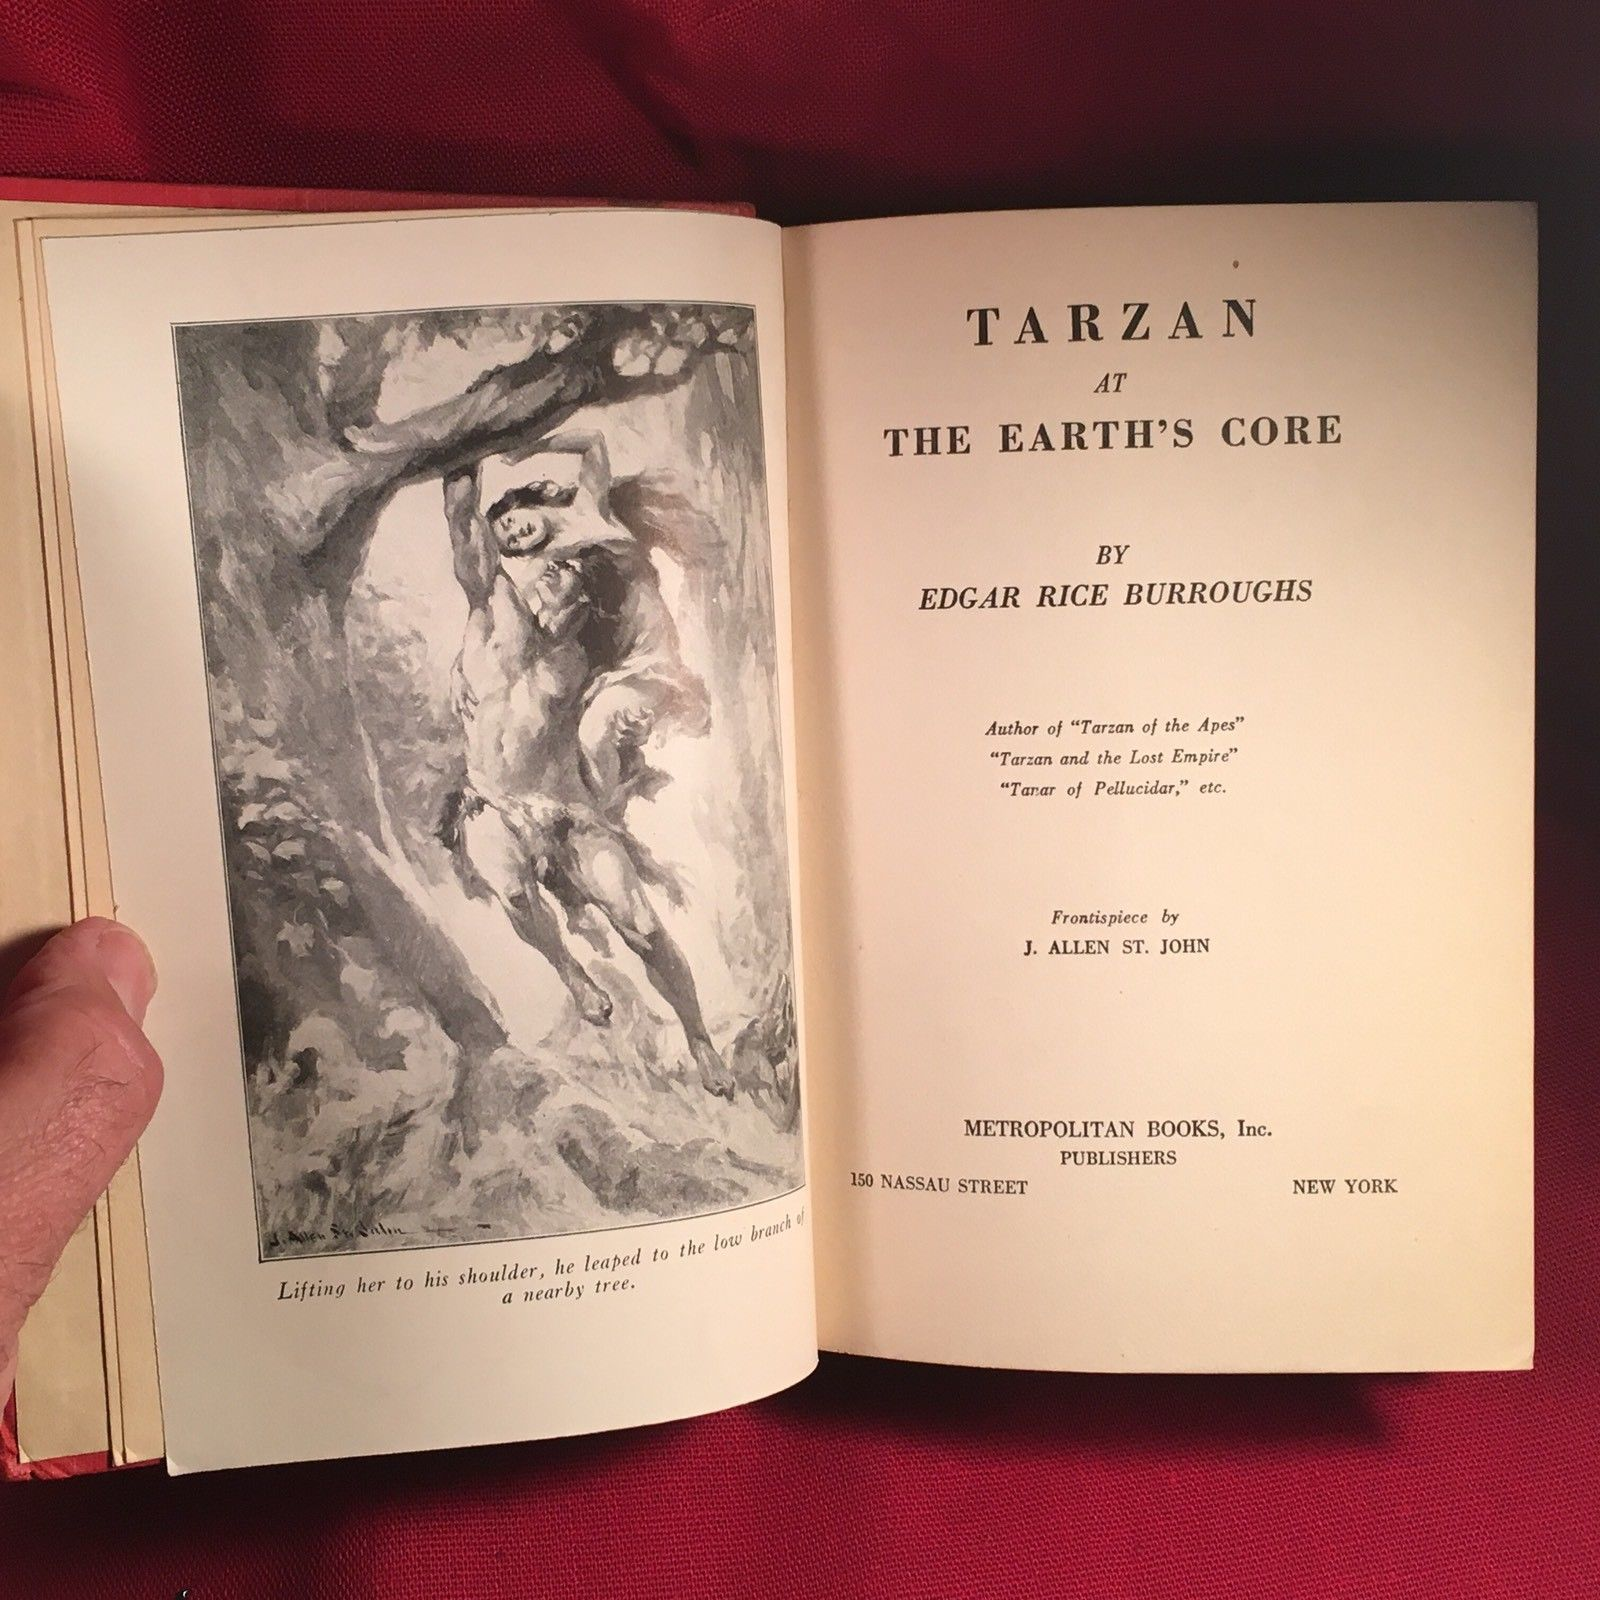 Edgar Rice Burroughs TARZAN AT THE EARTH'S CORE/1st  Nice Jacket